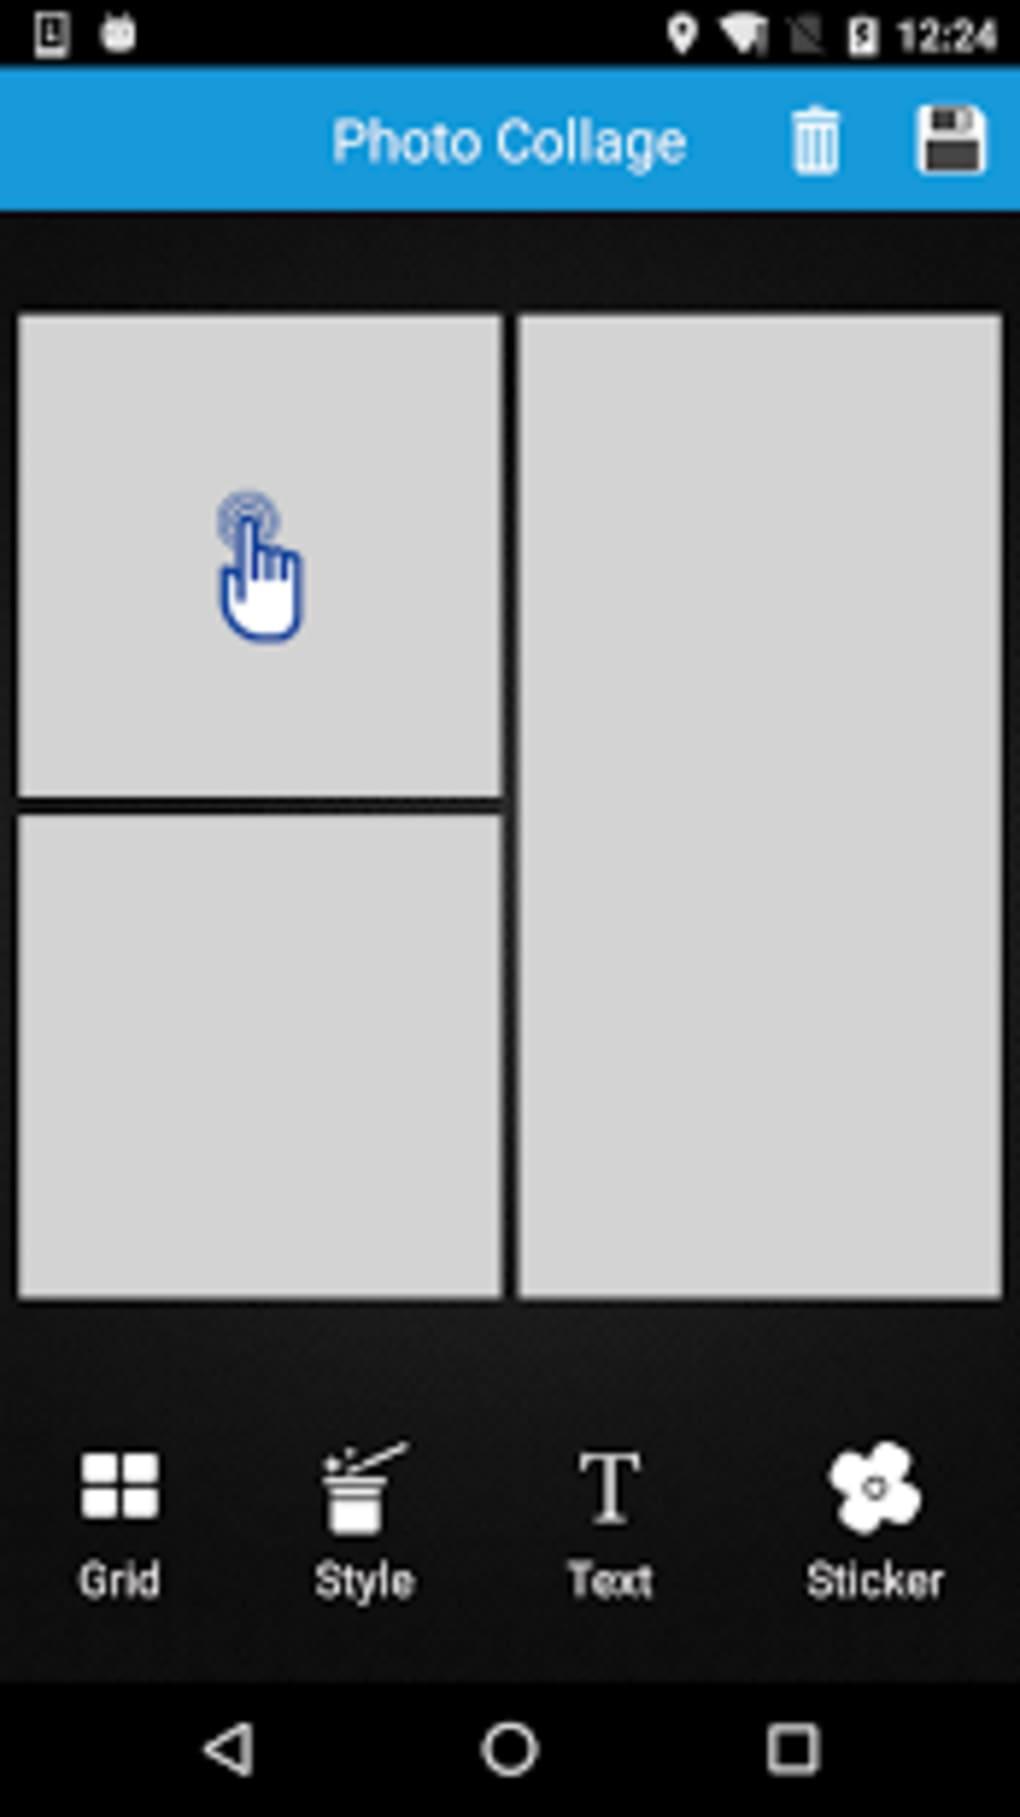 Photo Collage Editor für Android - Download